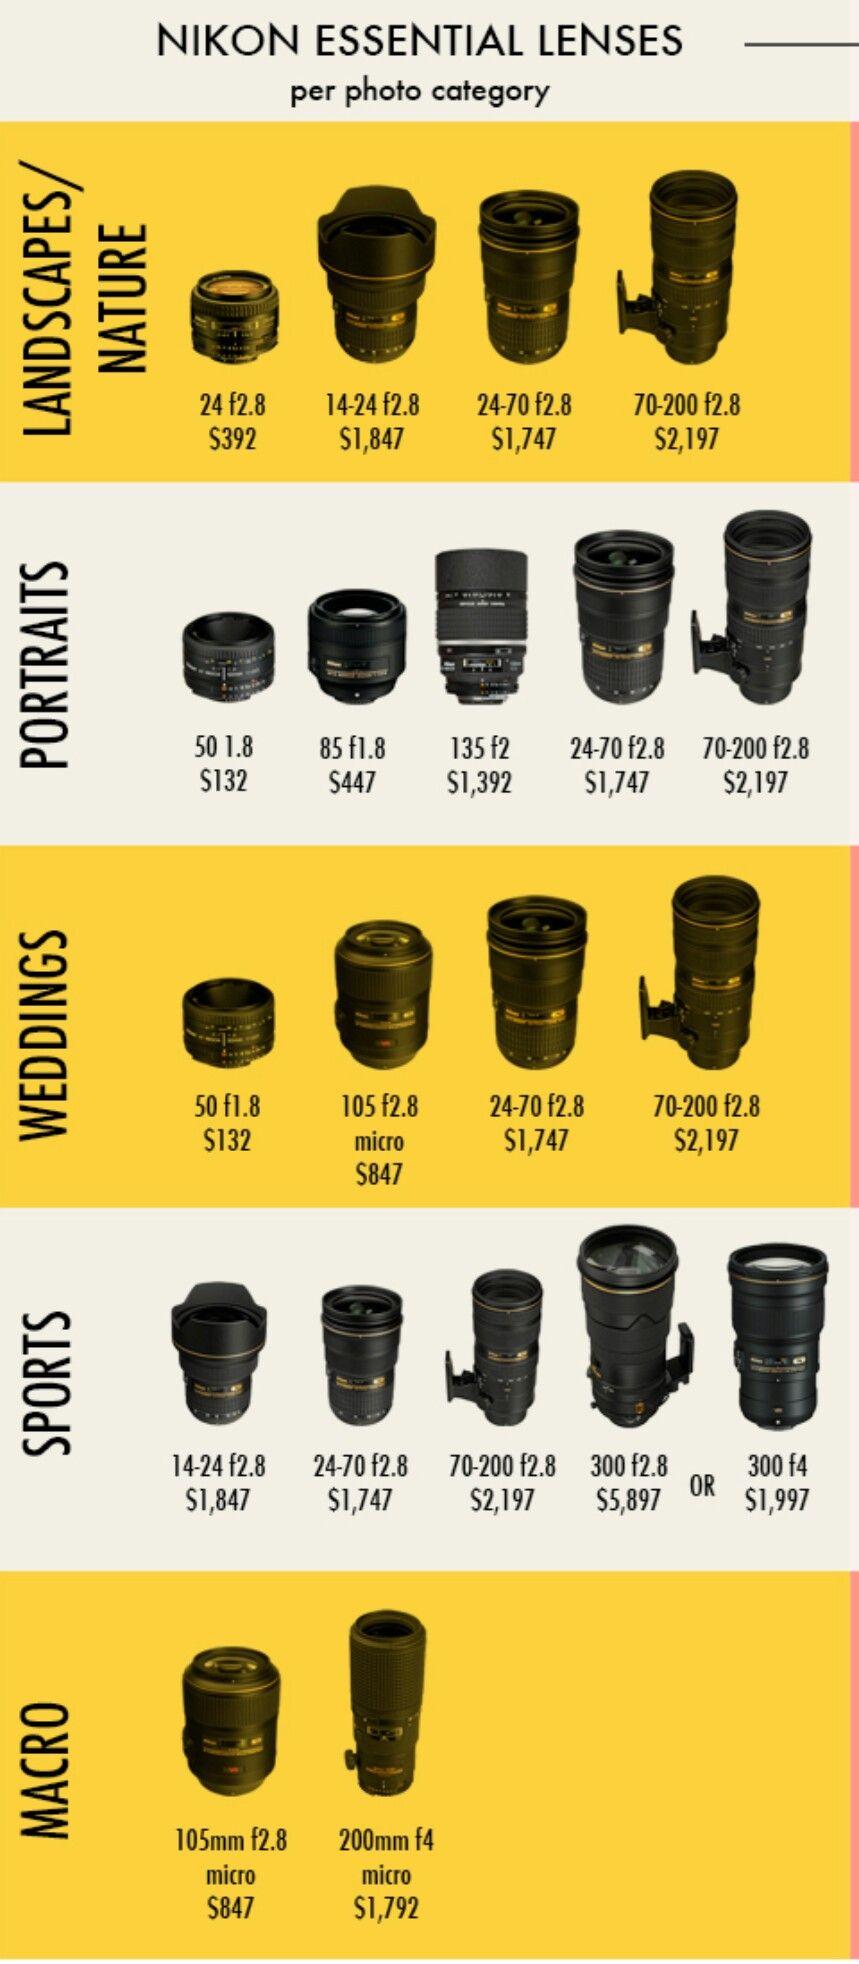 Nikon Essential Lenses Photography Tricks Nikon Photography Jobs Photography Tutorials